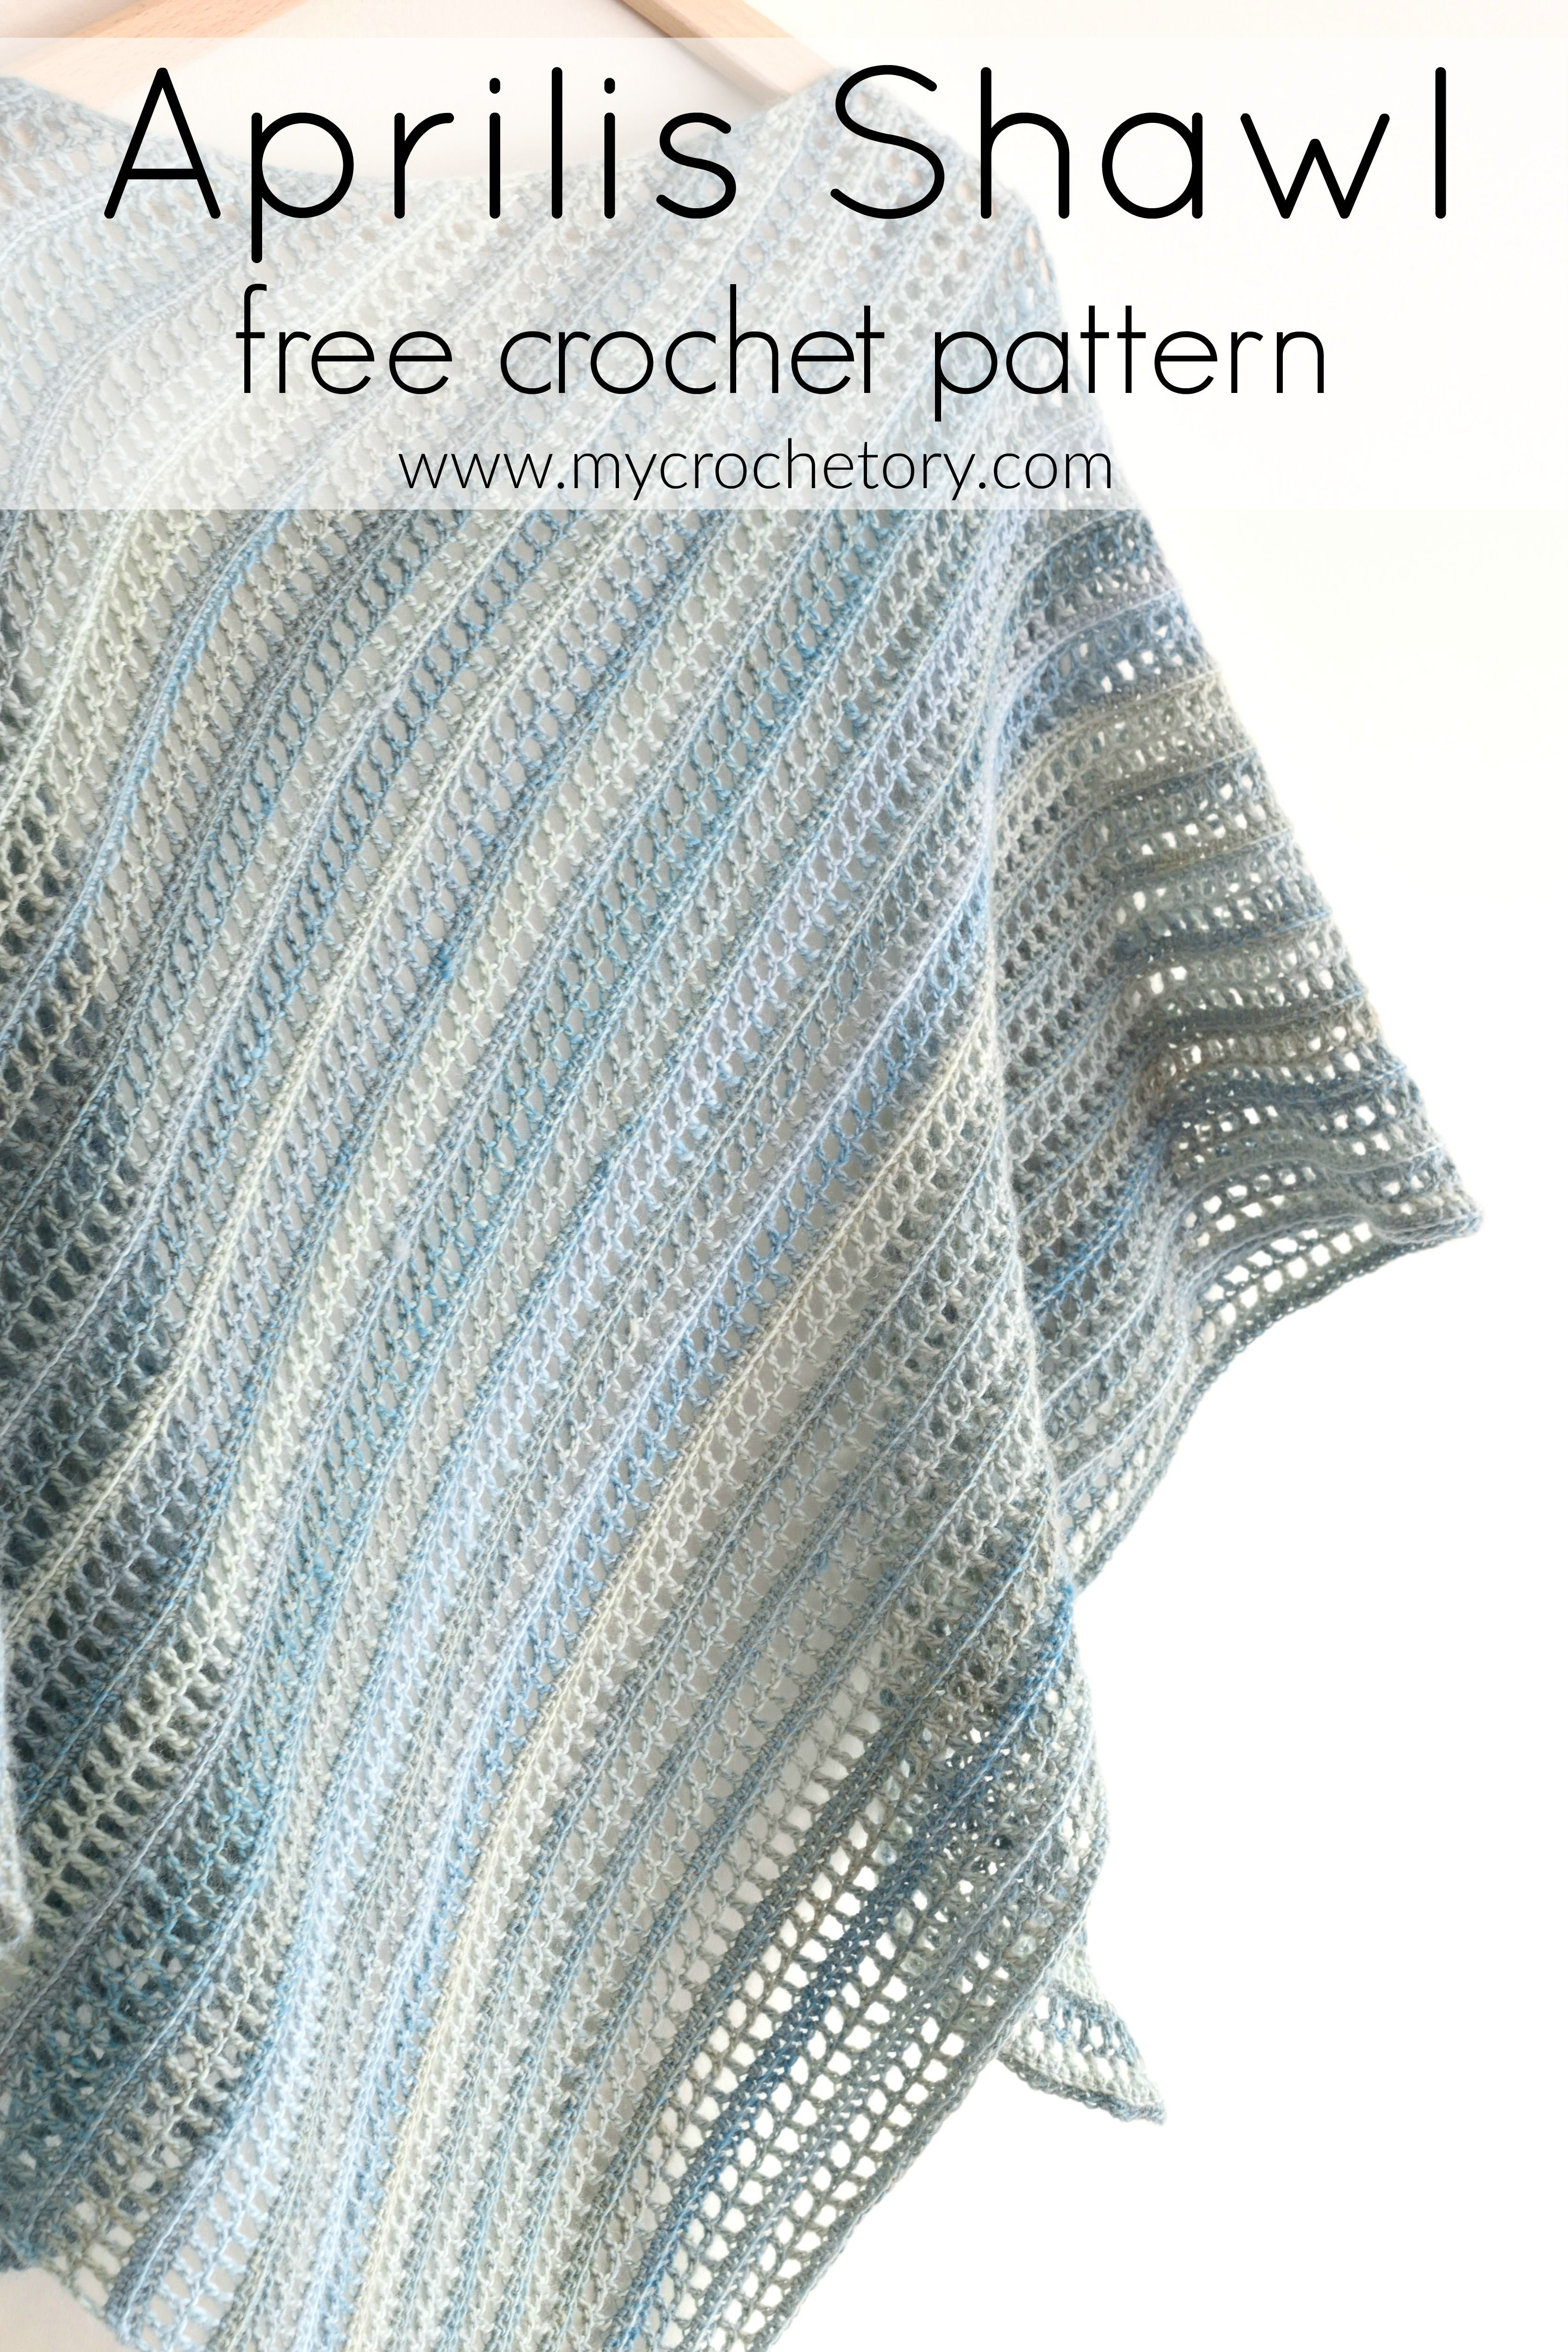 Aprilis Shawl - free crochet pattern by MyCrochetory   Crochet ...